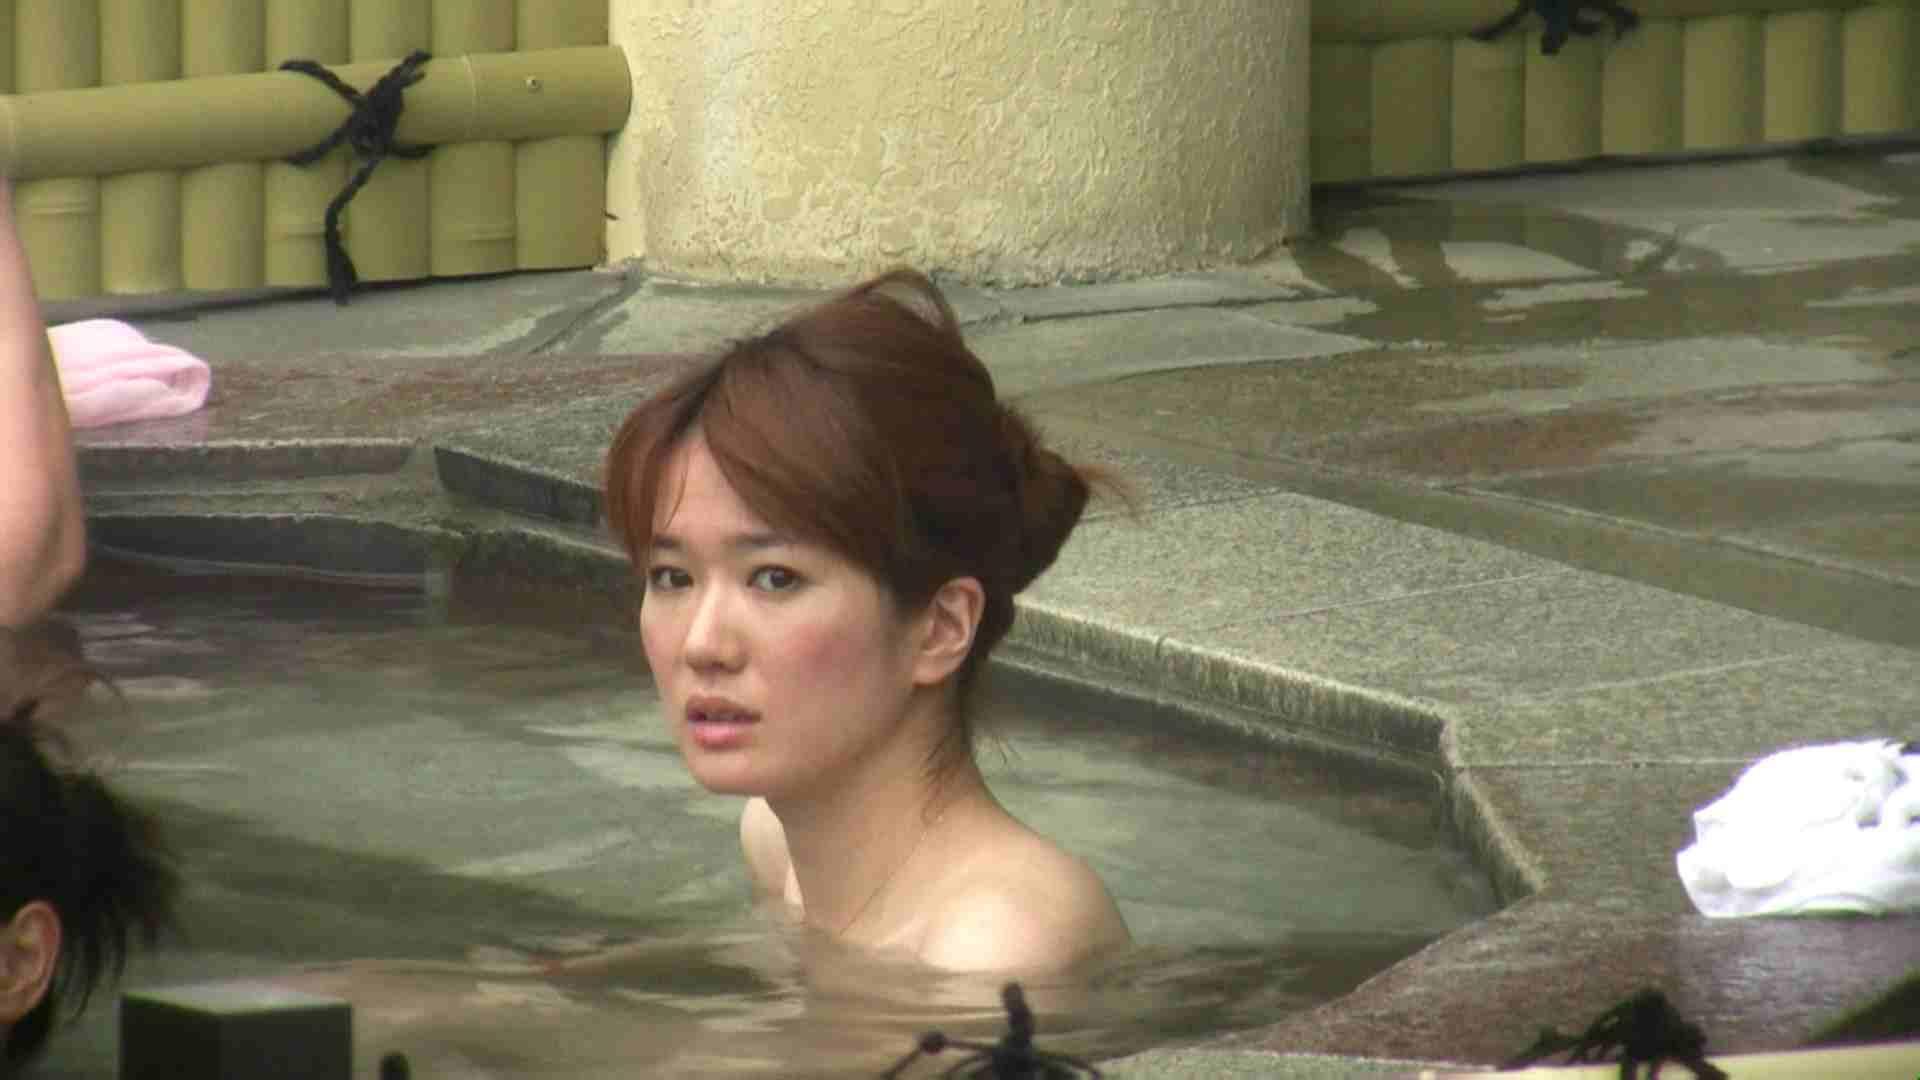 Aquaな露天風呂Vol.110 盗撮映像  46Pix 2